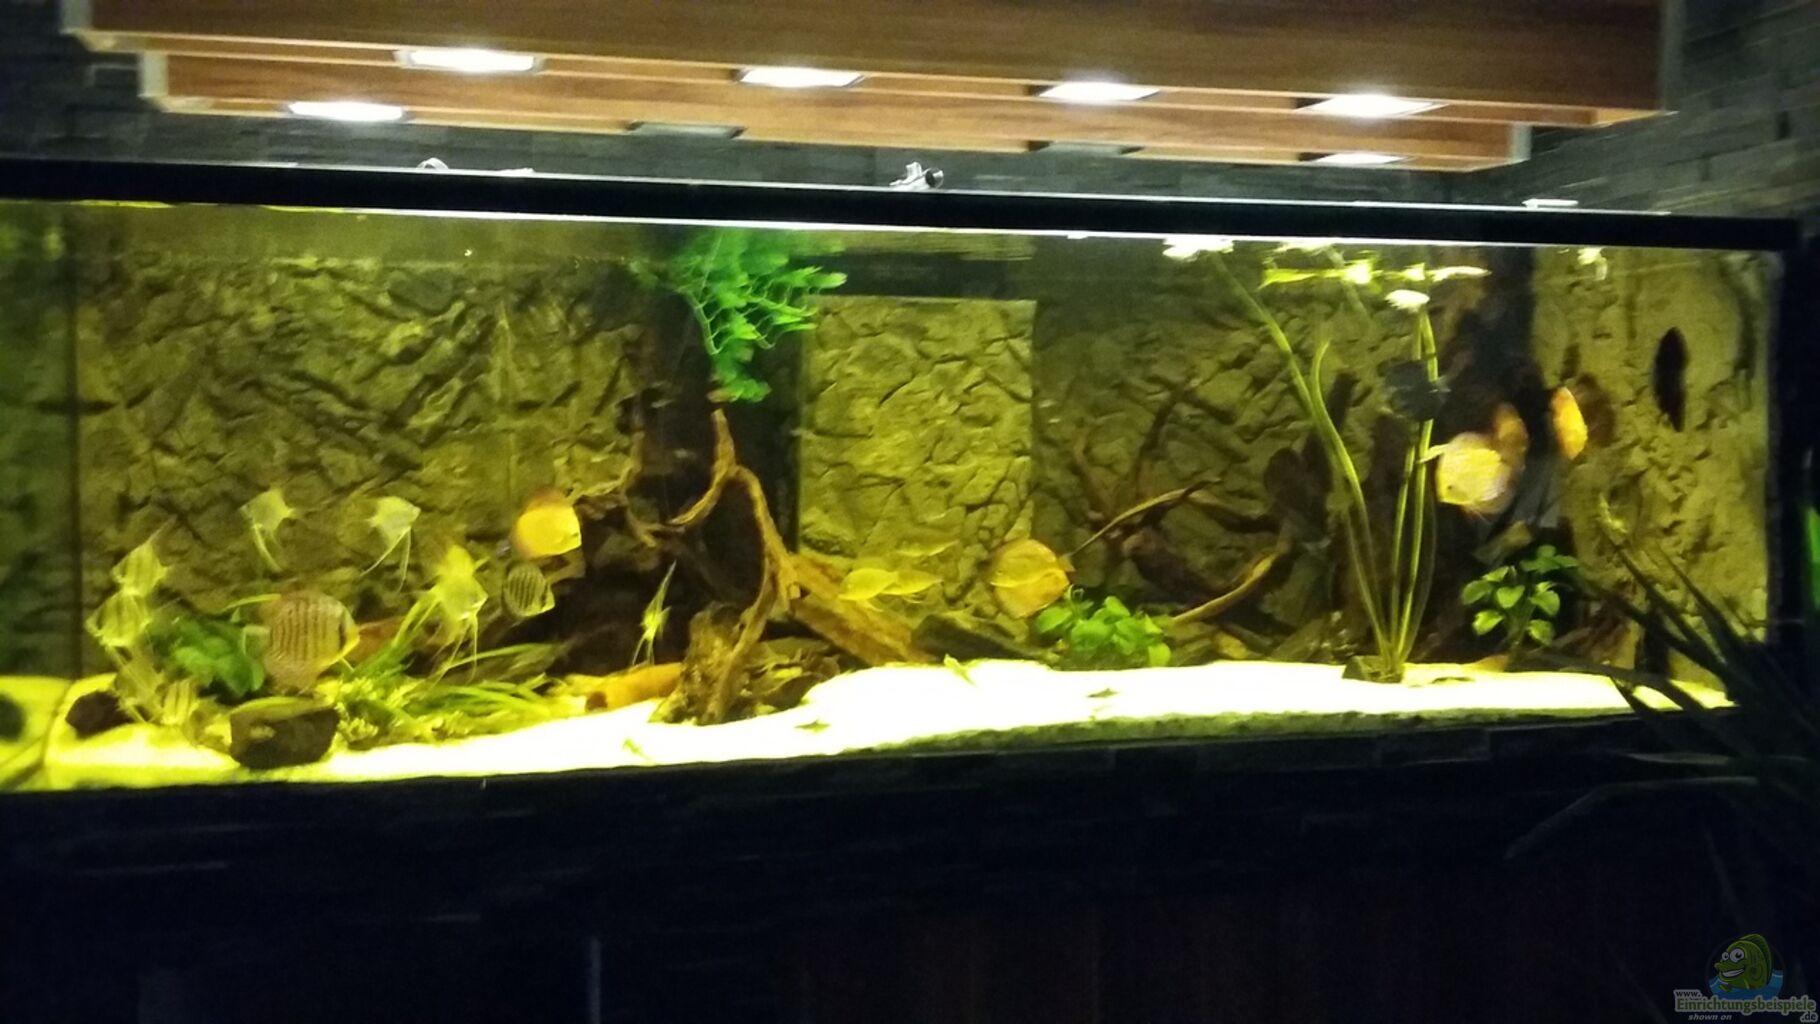 Aquarium Wohnzimmer Dekoration : Aquarium von t aquatics wohnzimmer uferzone